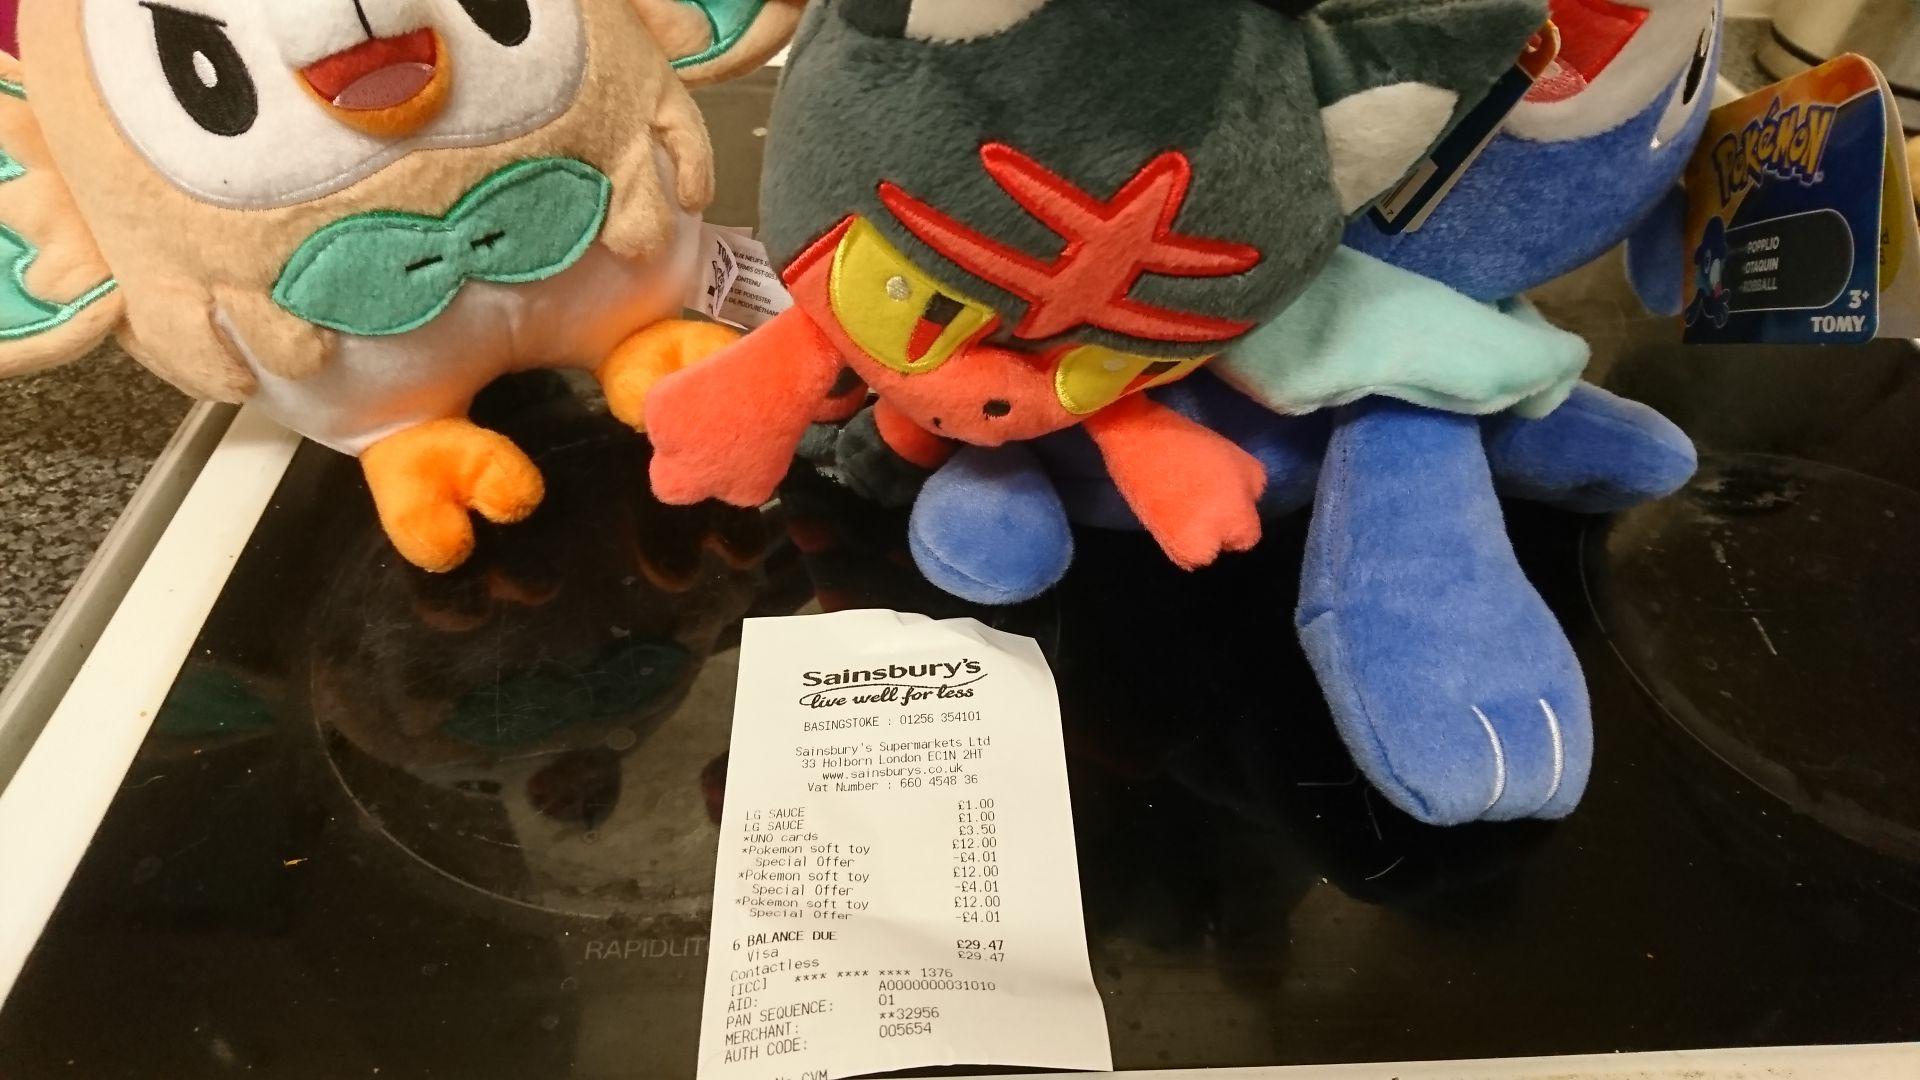 Pokemon plush £7.99 at Sainsbury's